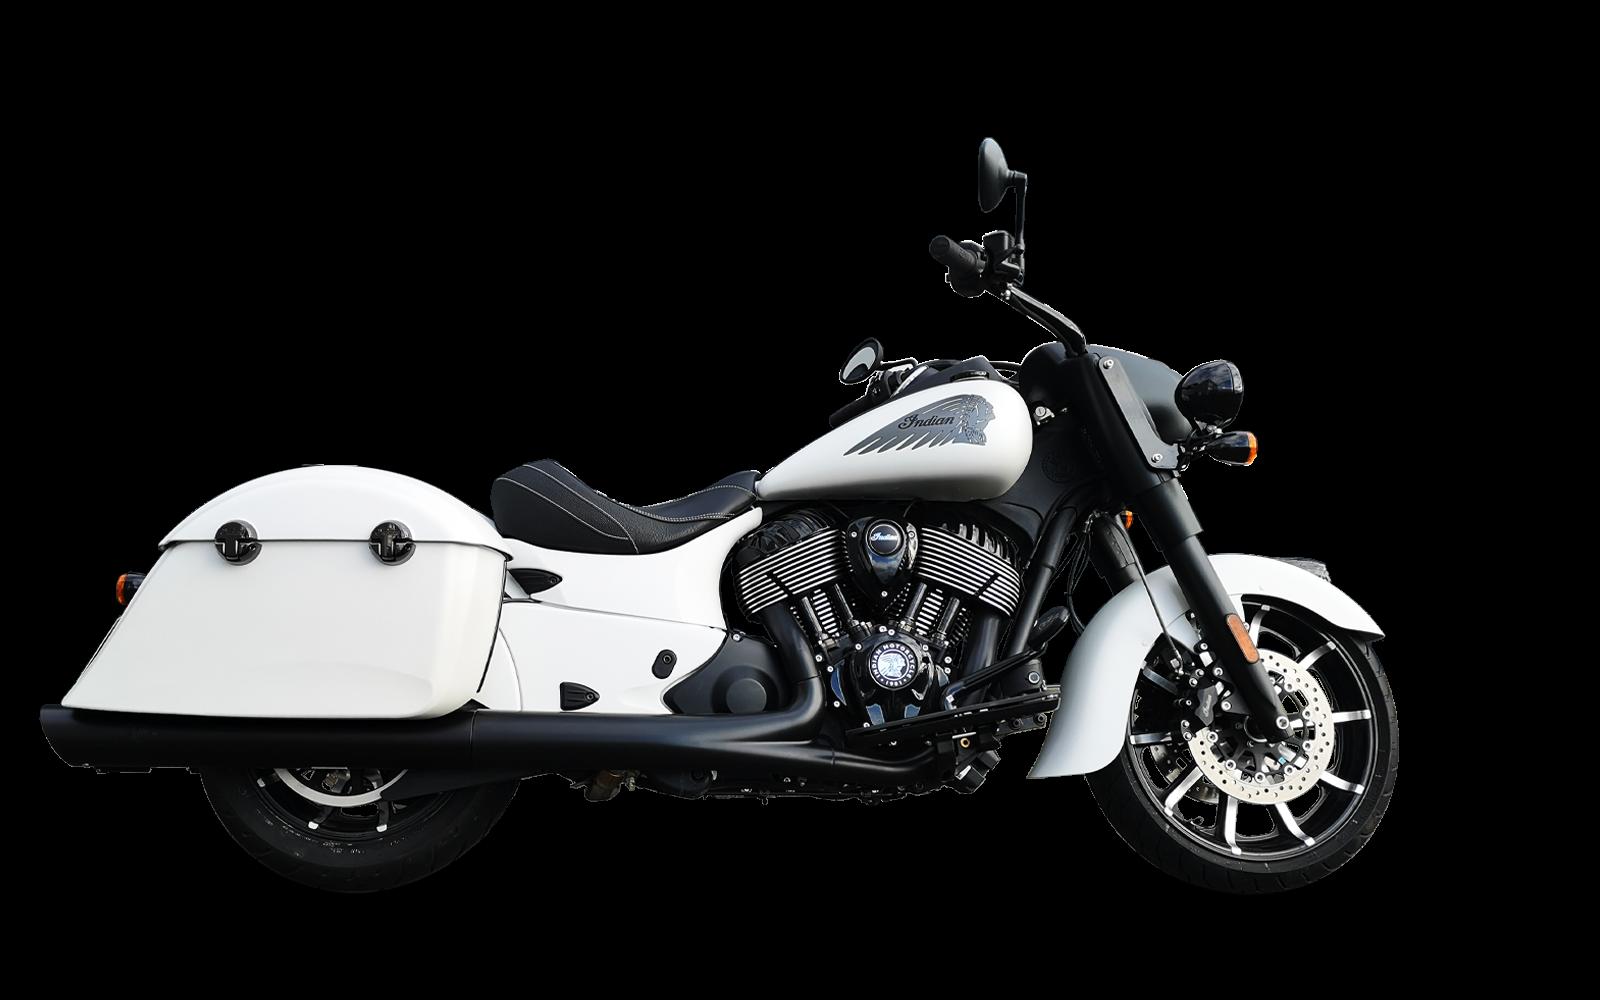 Bagger - Chieftain Dark Horse - TS116 - 2020 - Endtöpfe